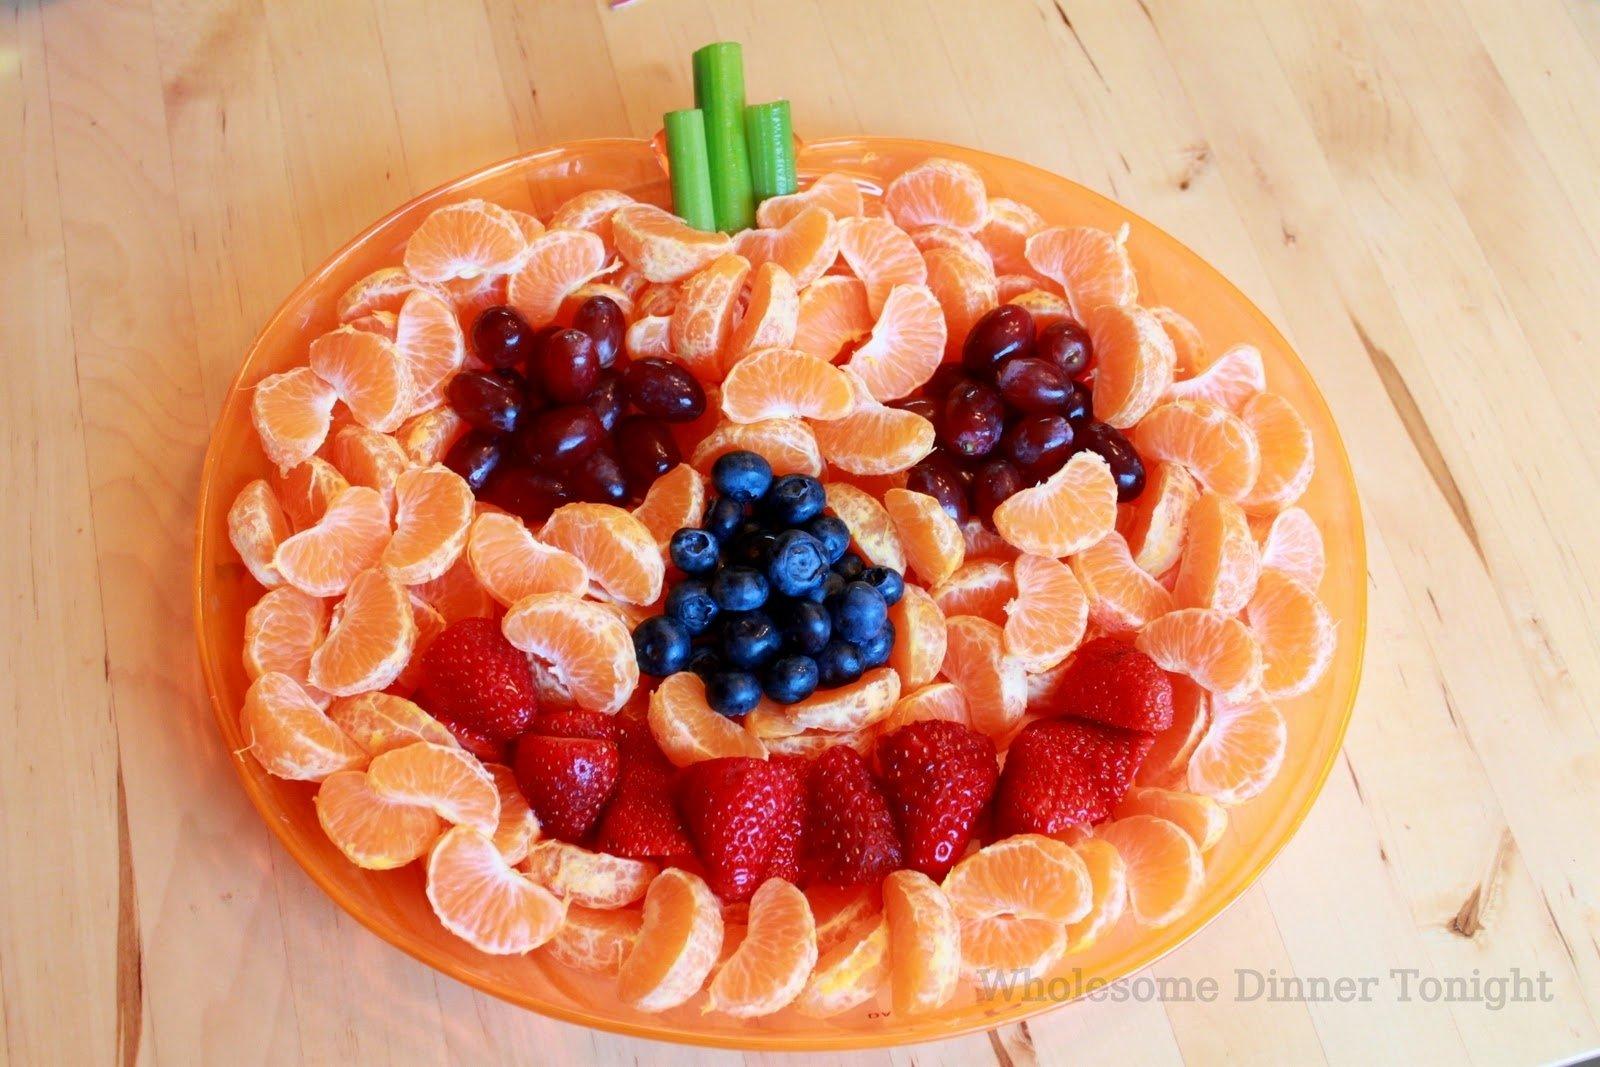 10 Ideal Halloween Food Ideas For Adults top 15 paleo halloween treats party food ideas 2 2020